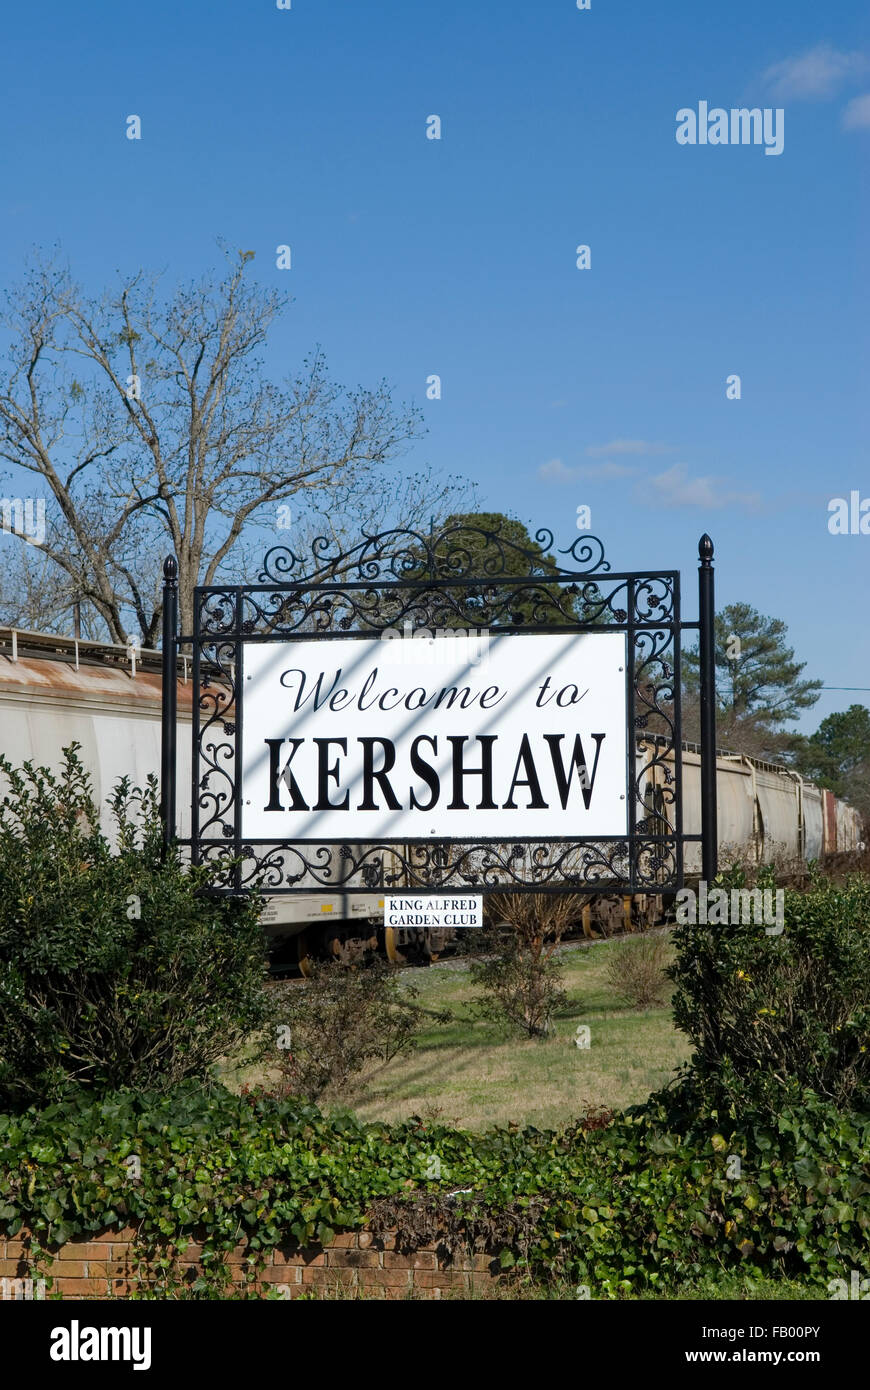 Welcome to Kershaw sign South Carolina USA - Stock Image